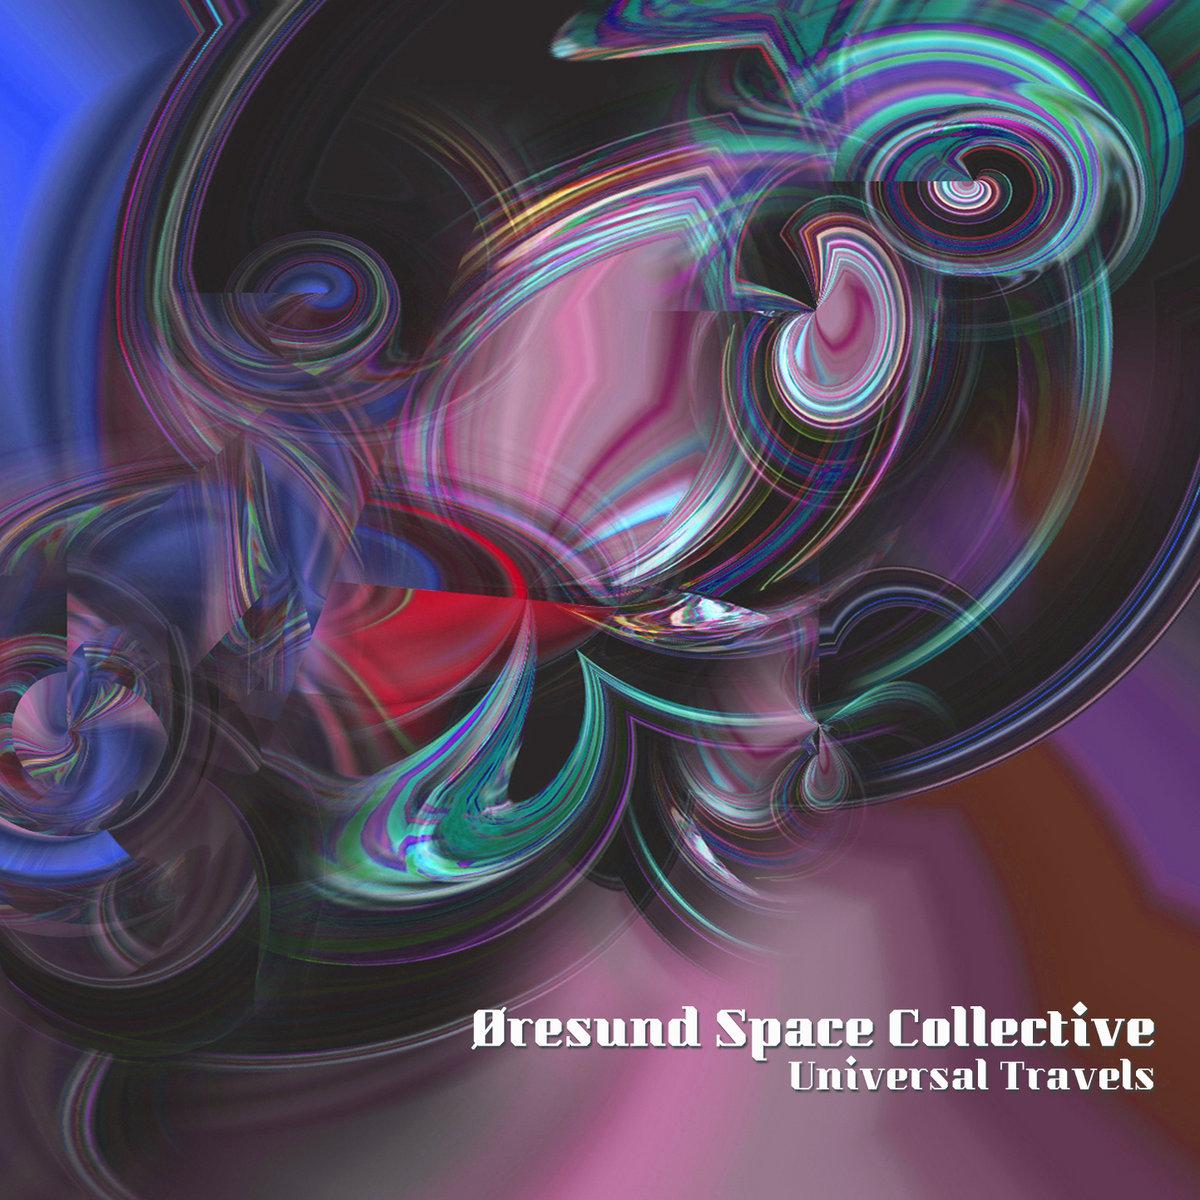 oresund space collective universal travels